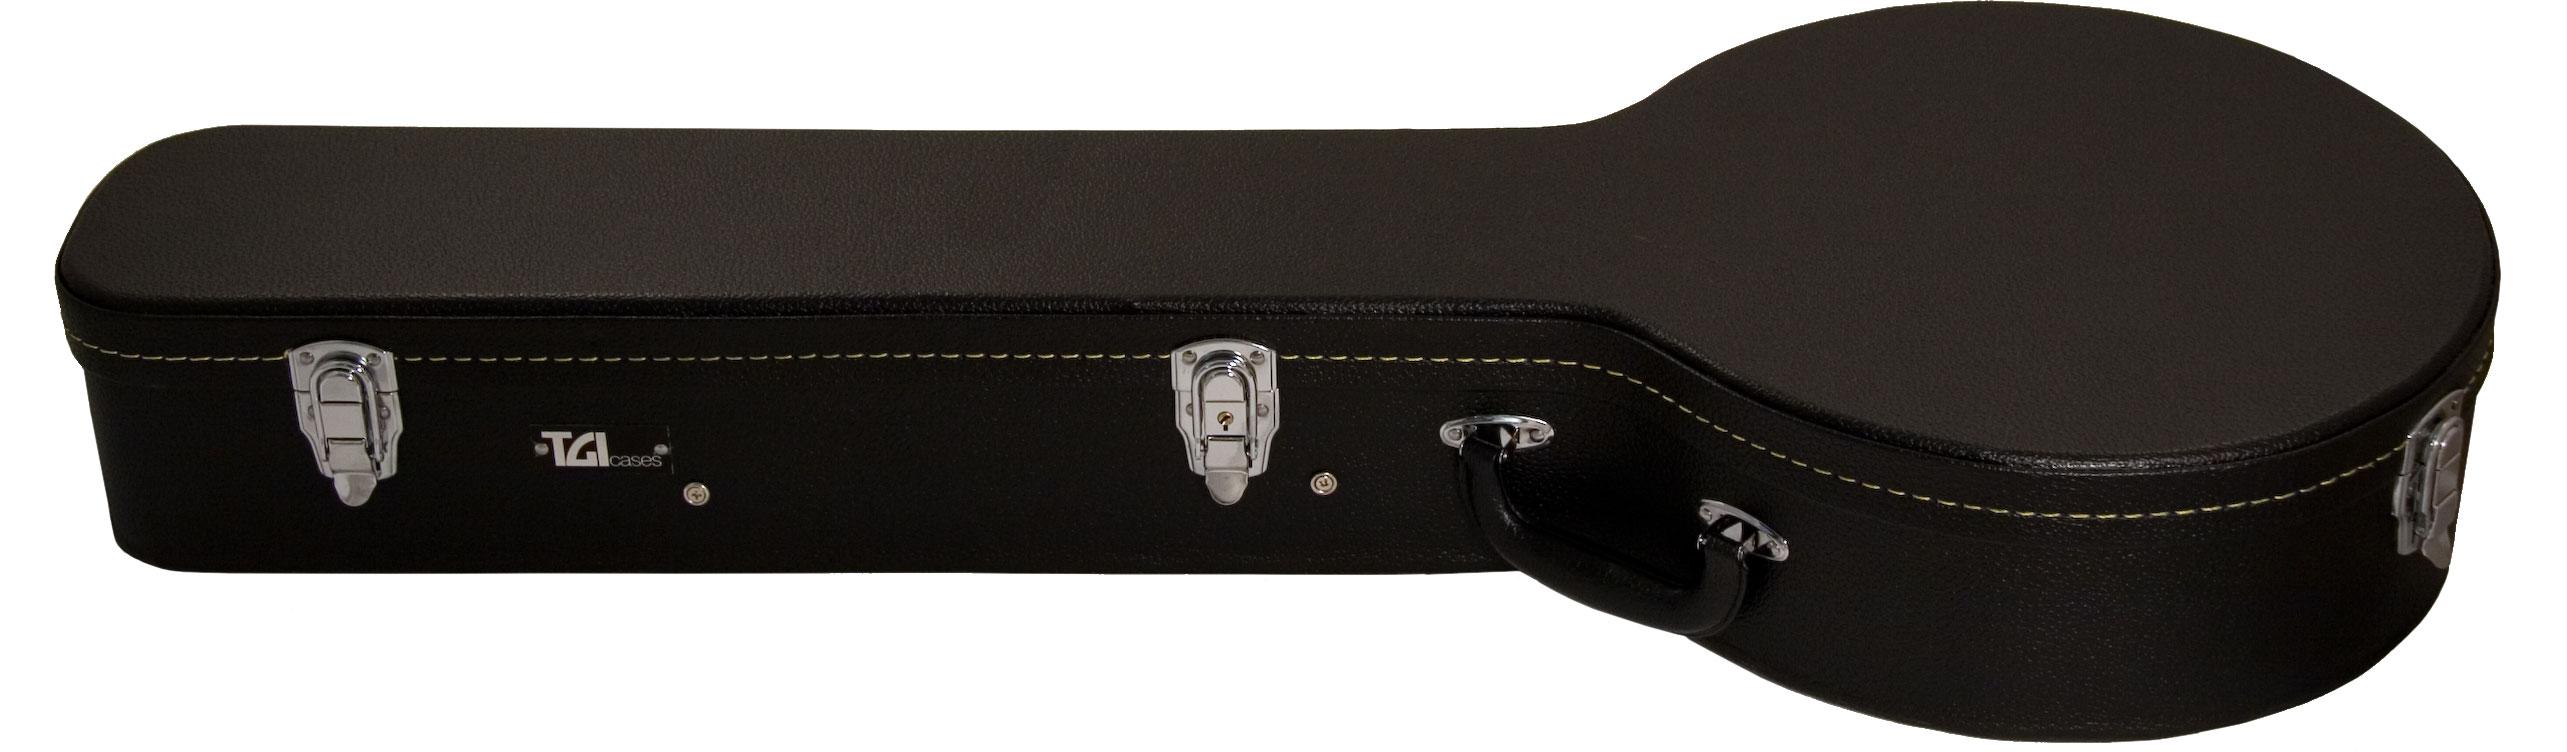 TGI Case Wood Banjo 5 String Wooden